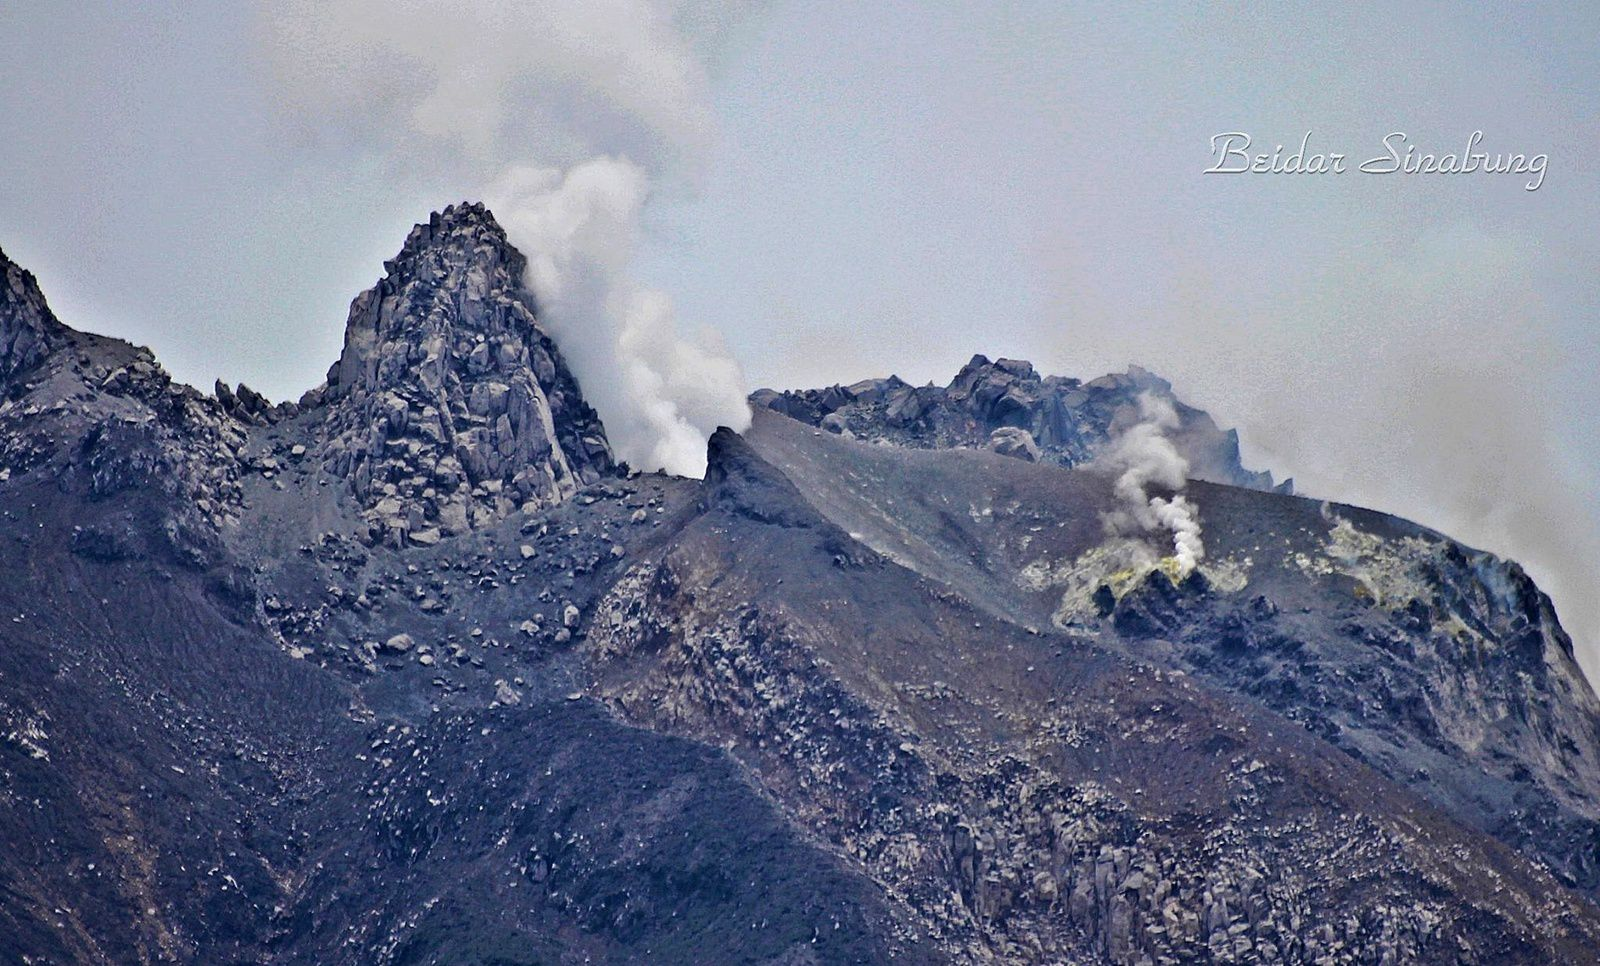 Sinabung - sommet à la morphologie changeante - photo Firdaus Surbakti / Beidar Sinabung